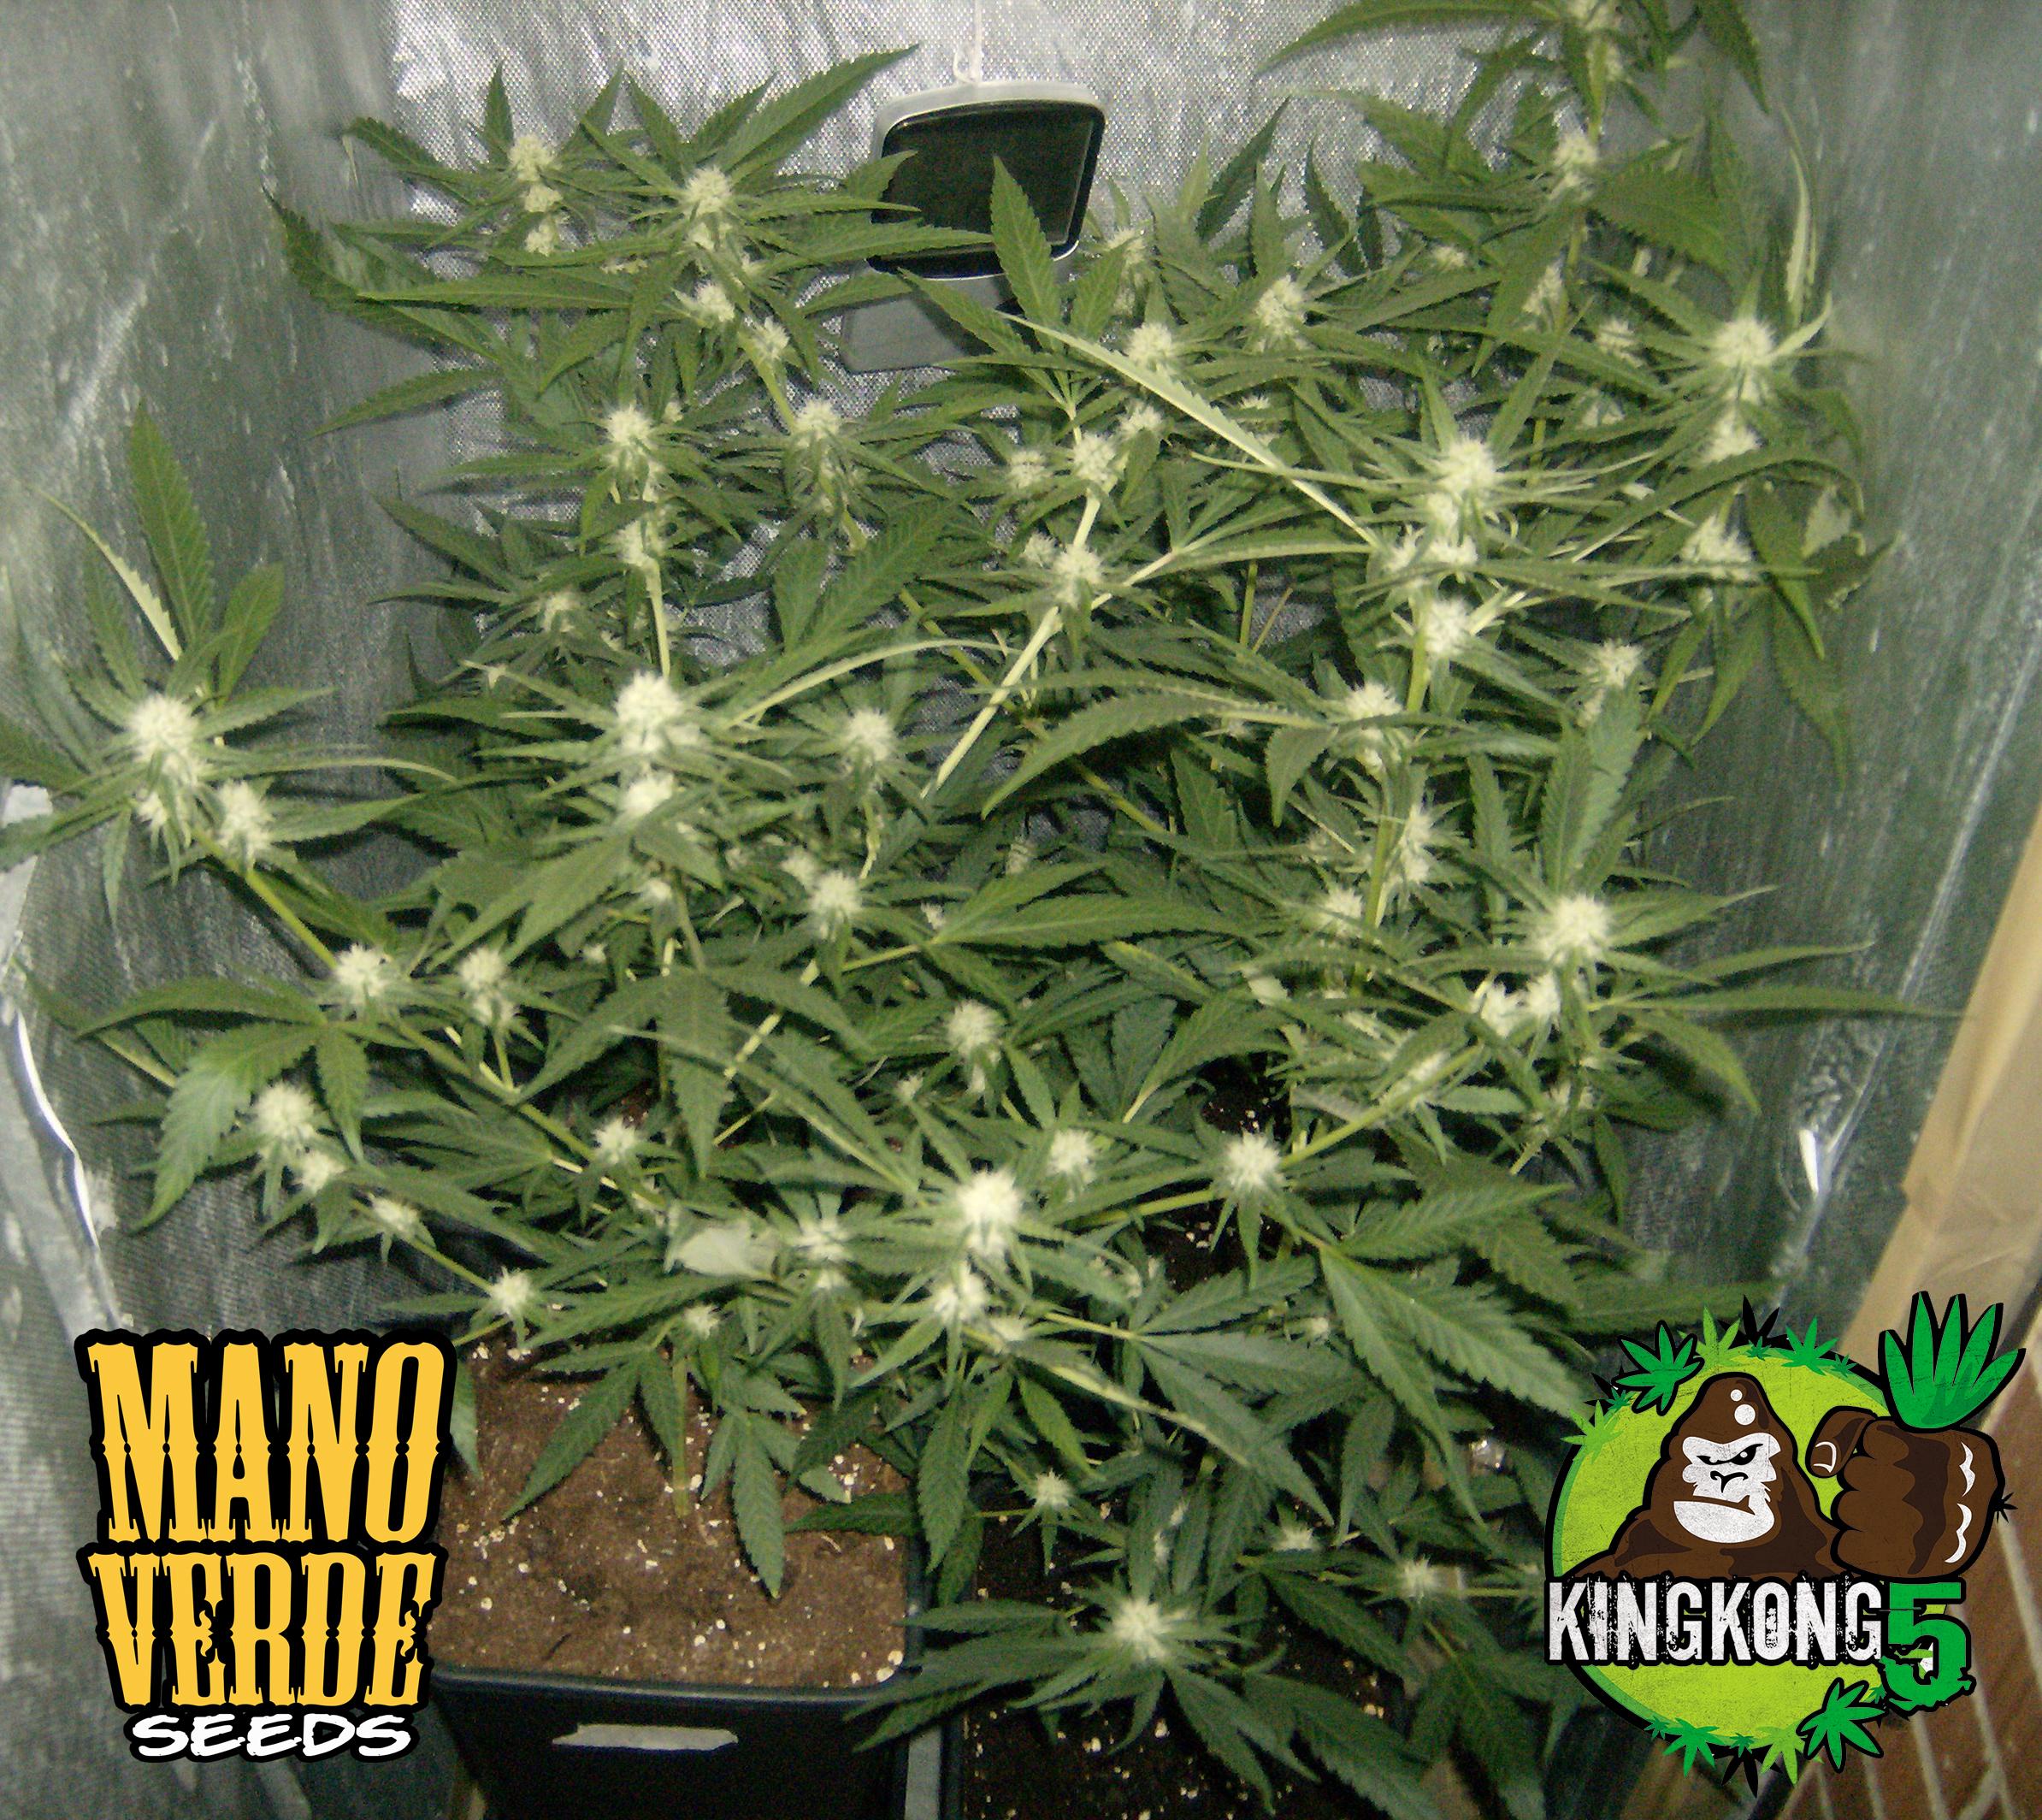 King Kong Five Manoverde Seeds 34C-21F-150